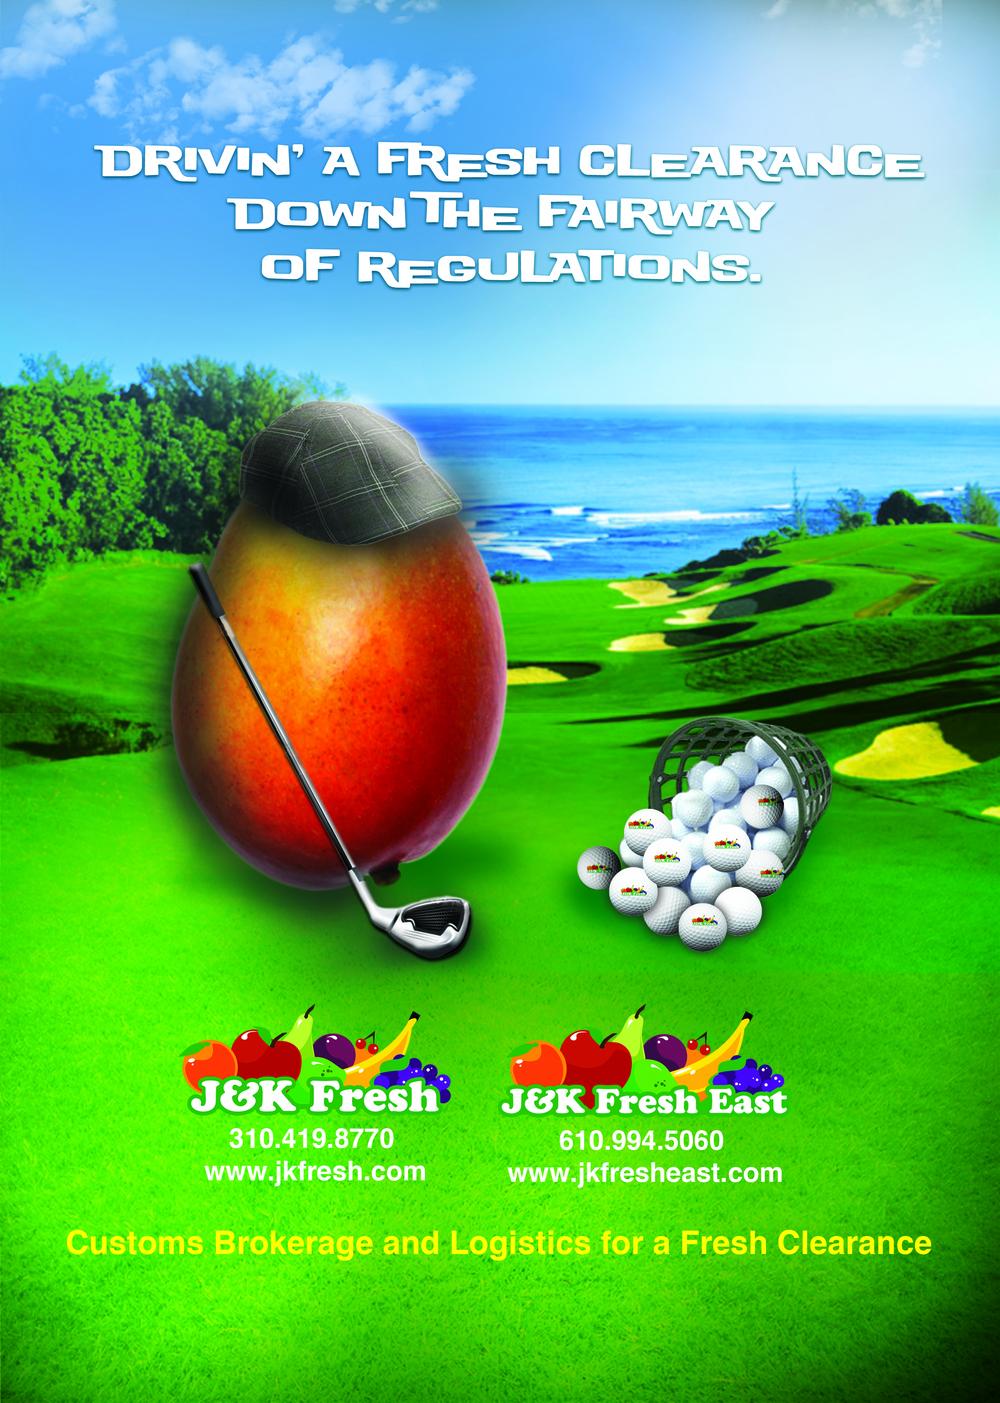 Golf ad-AMF.jpg